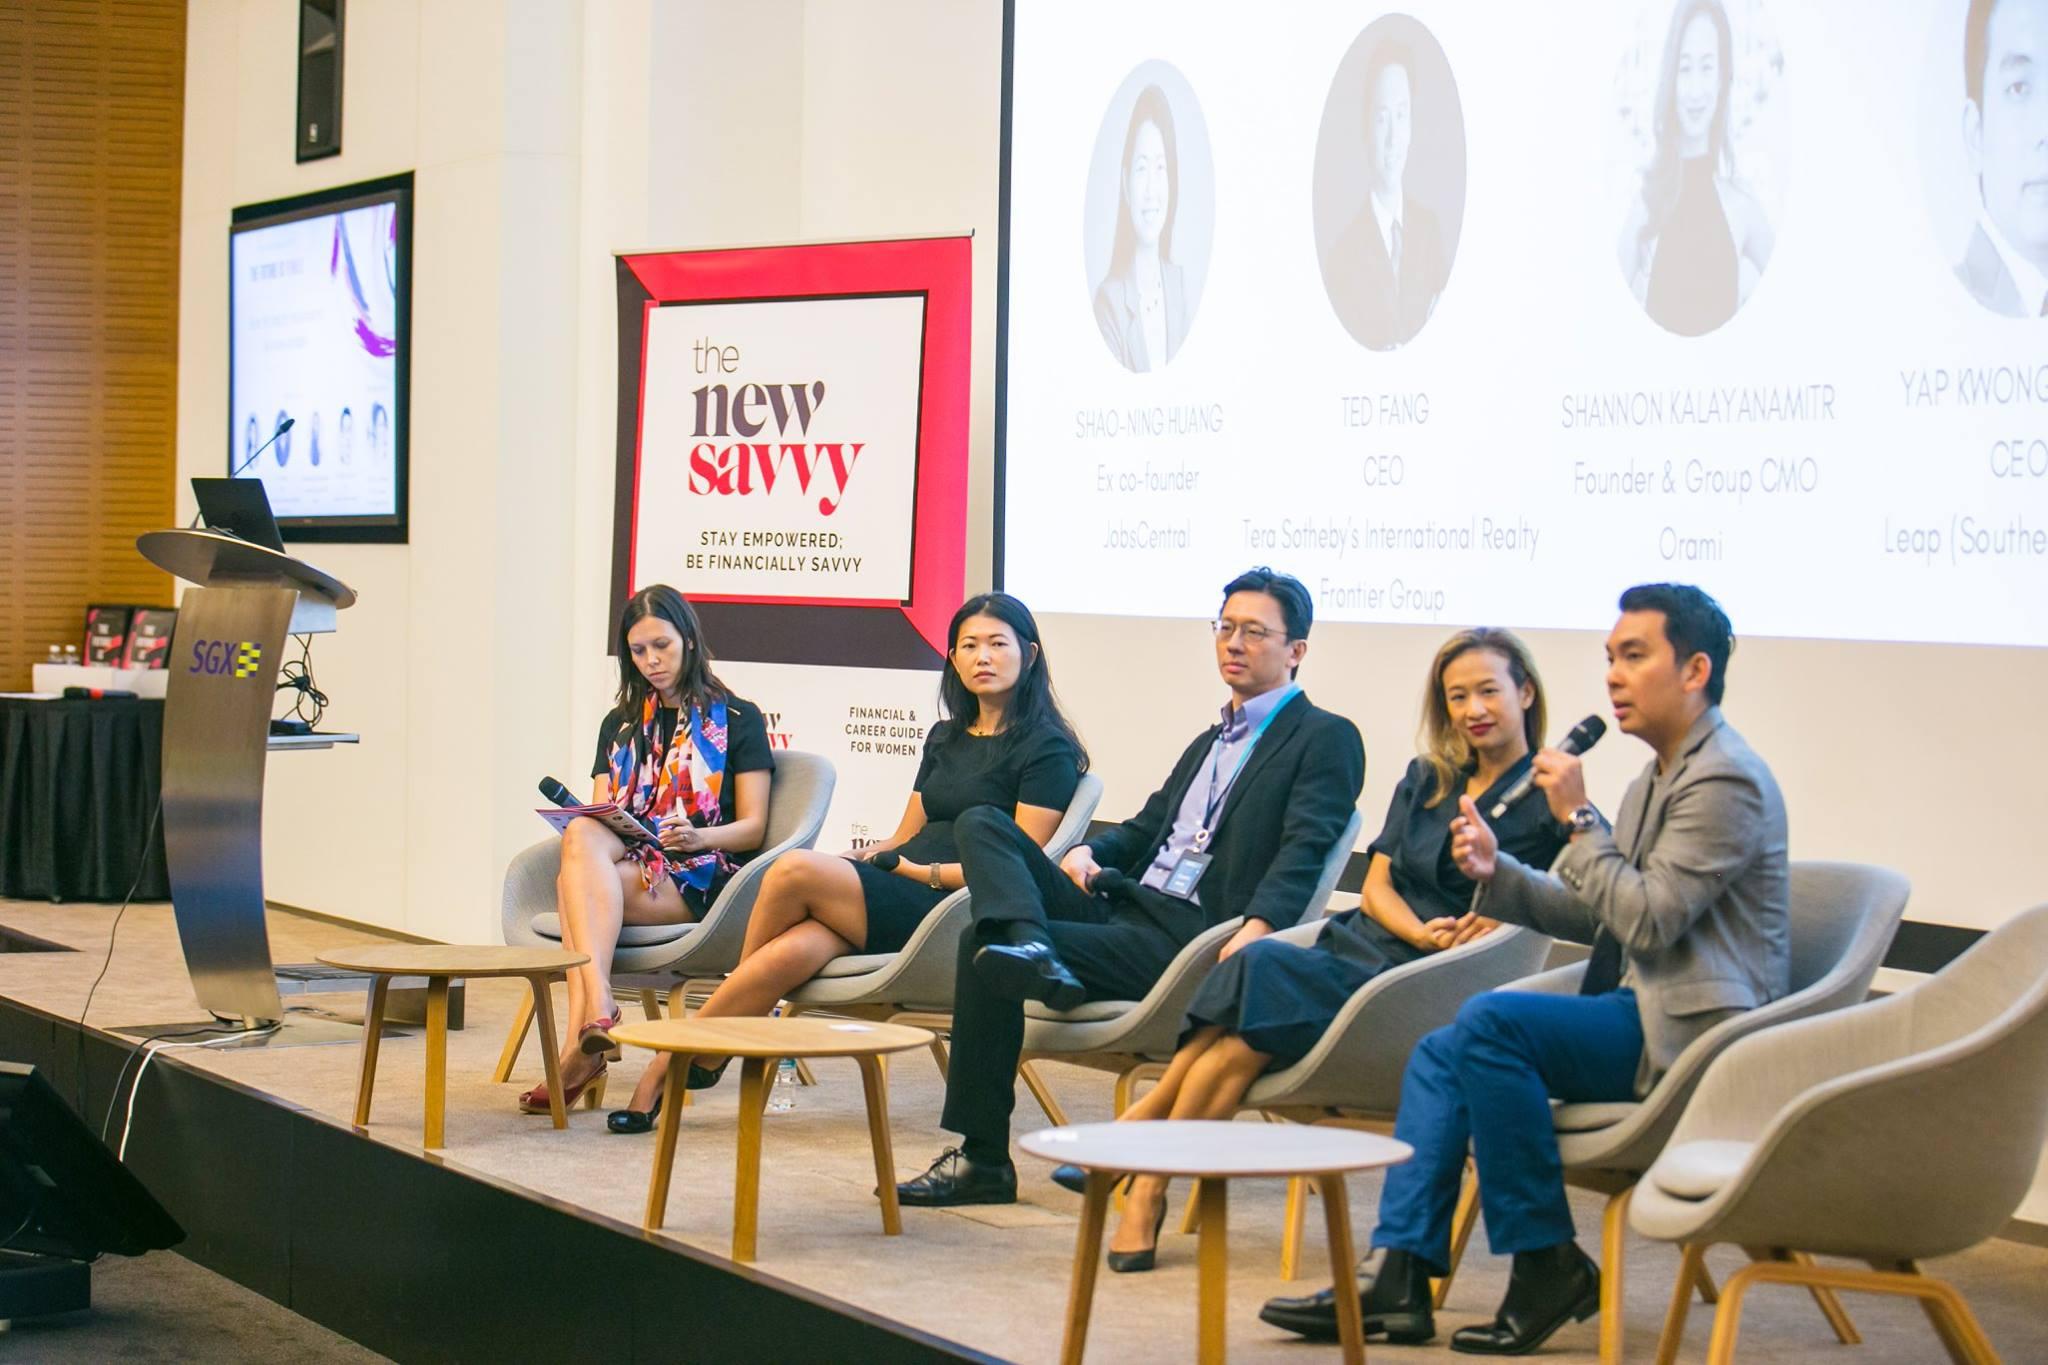 Shaoning Huang, Shannon Kalayanamitr, Ted Fang, Yap Kwong Weng, Grace Clapham